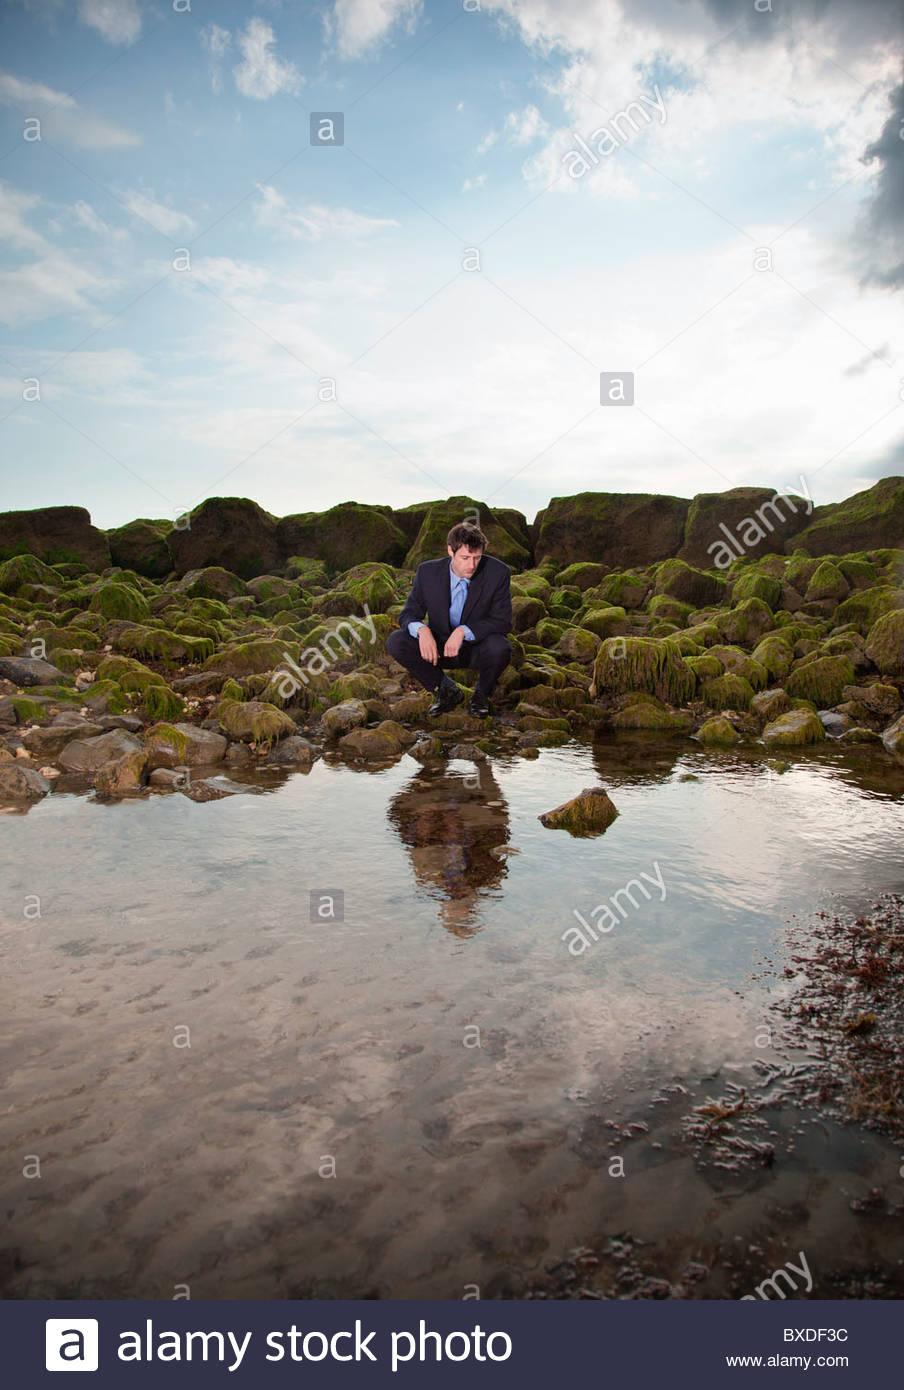 Businessman squatting near ocean tide pool - Stock Image